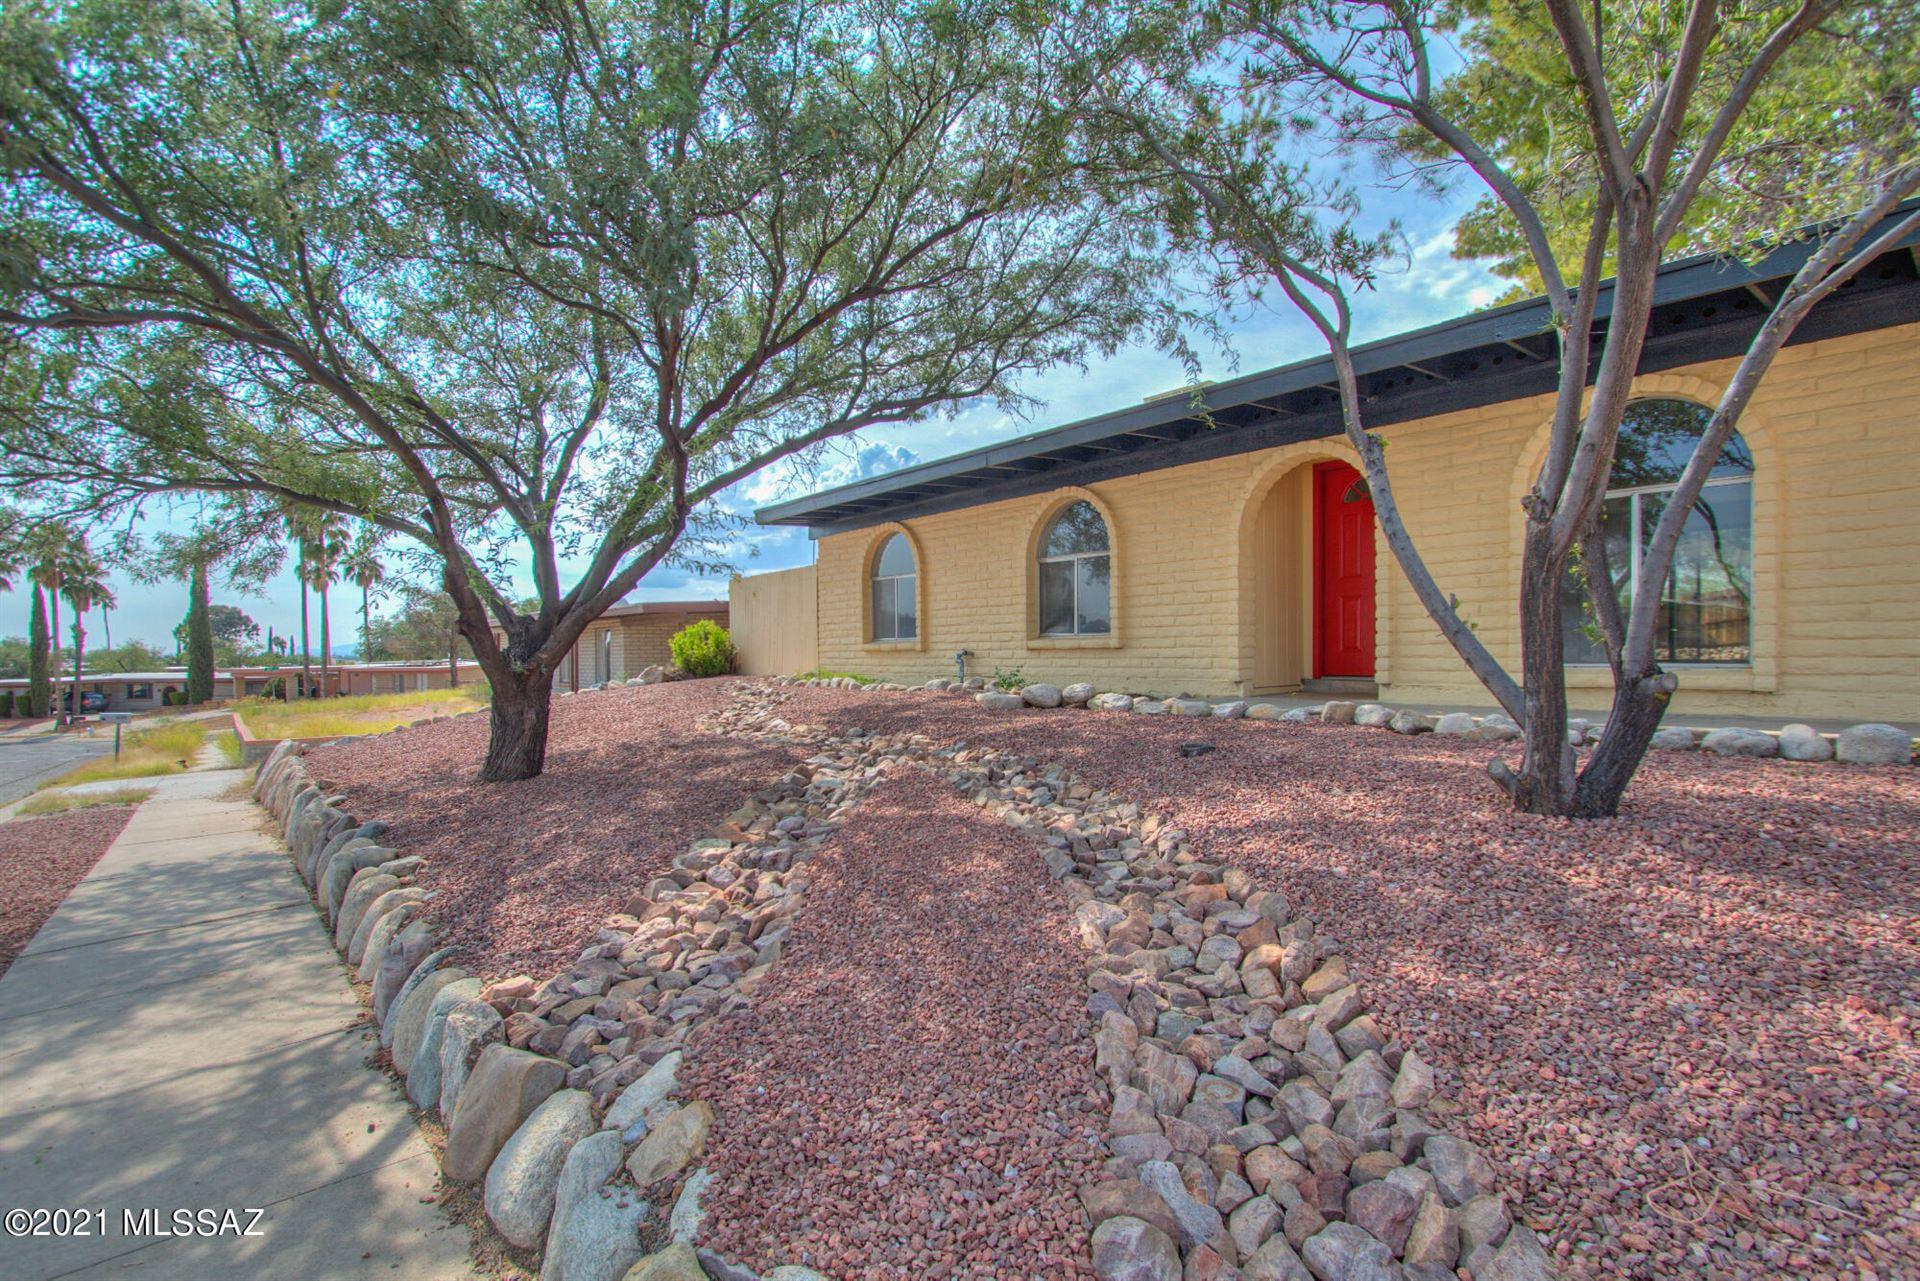 2912 S Portia Avenue, Tucson, AZ 85730 - MLS#: 22121570